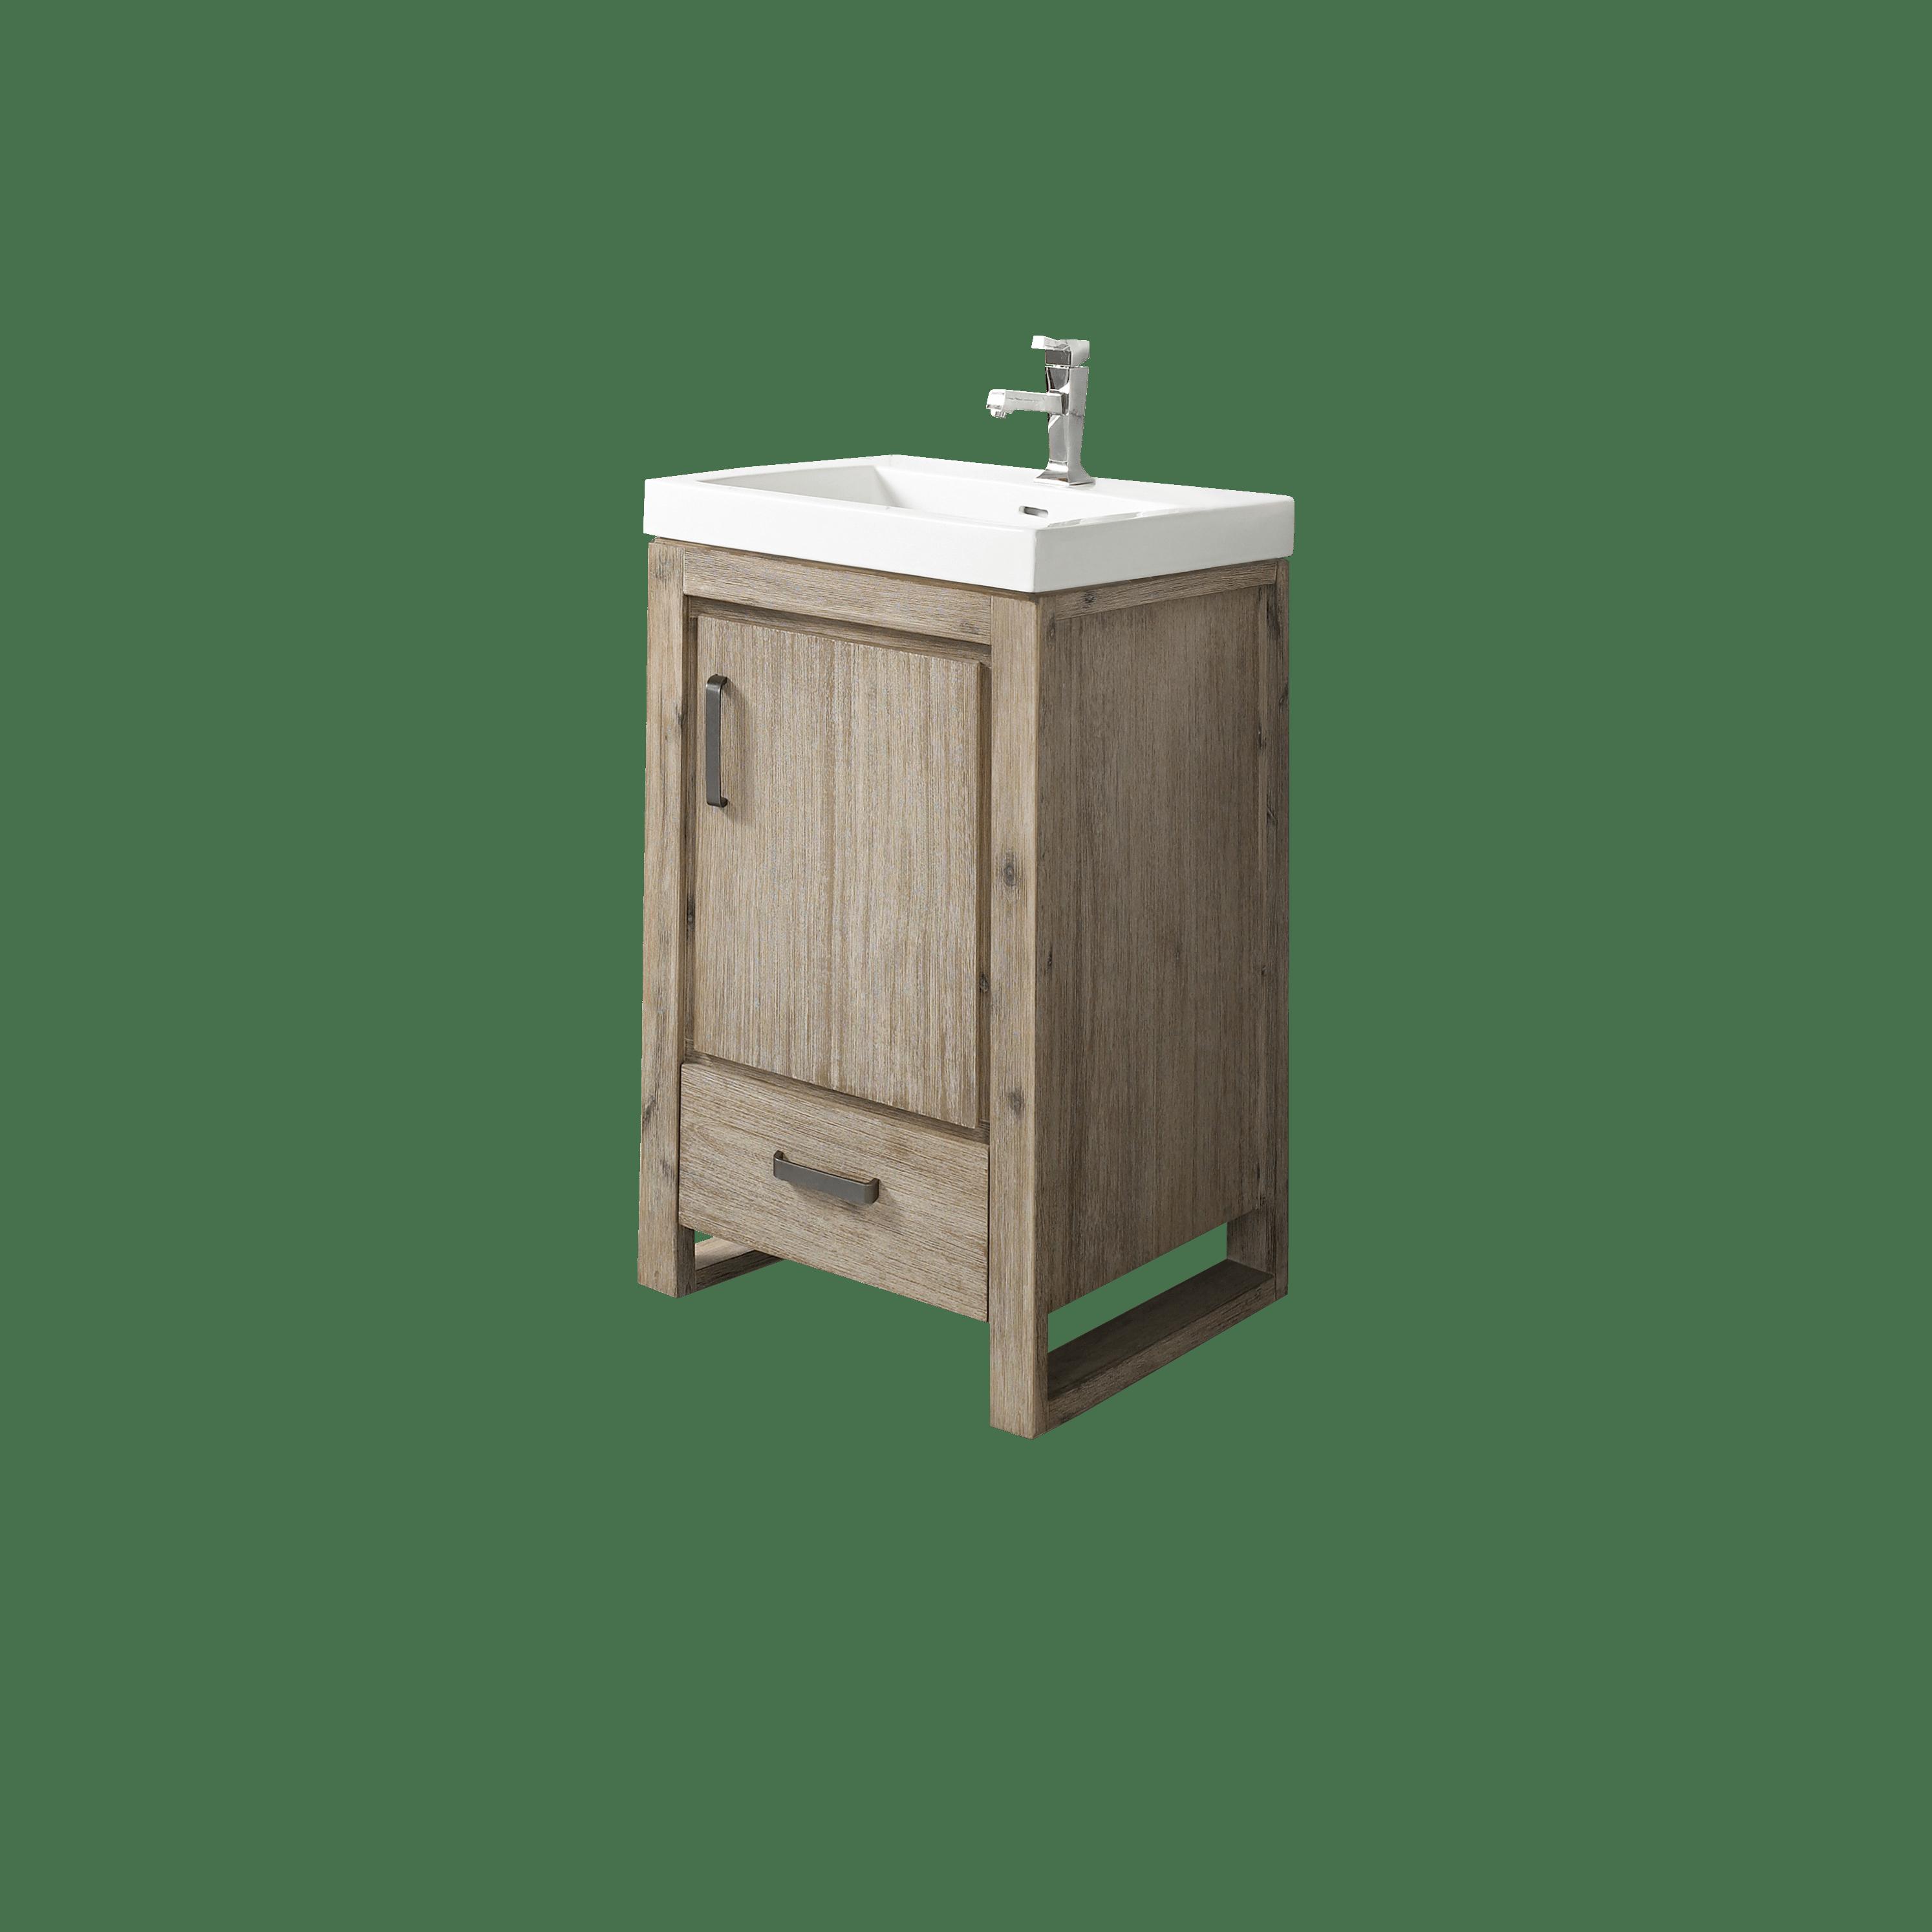 Fairmont Designs 1530-V2118 Oasis Bathroom Vanity | QualityBath.com